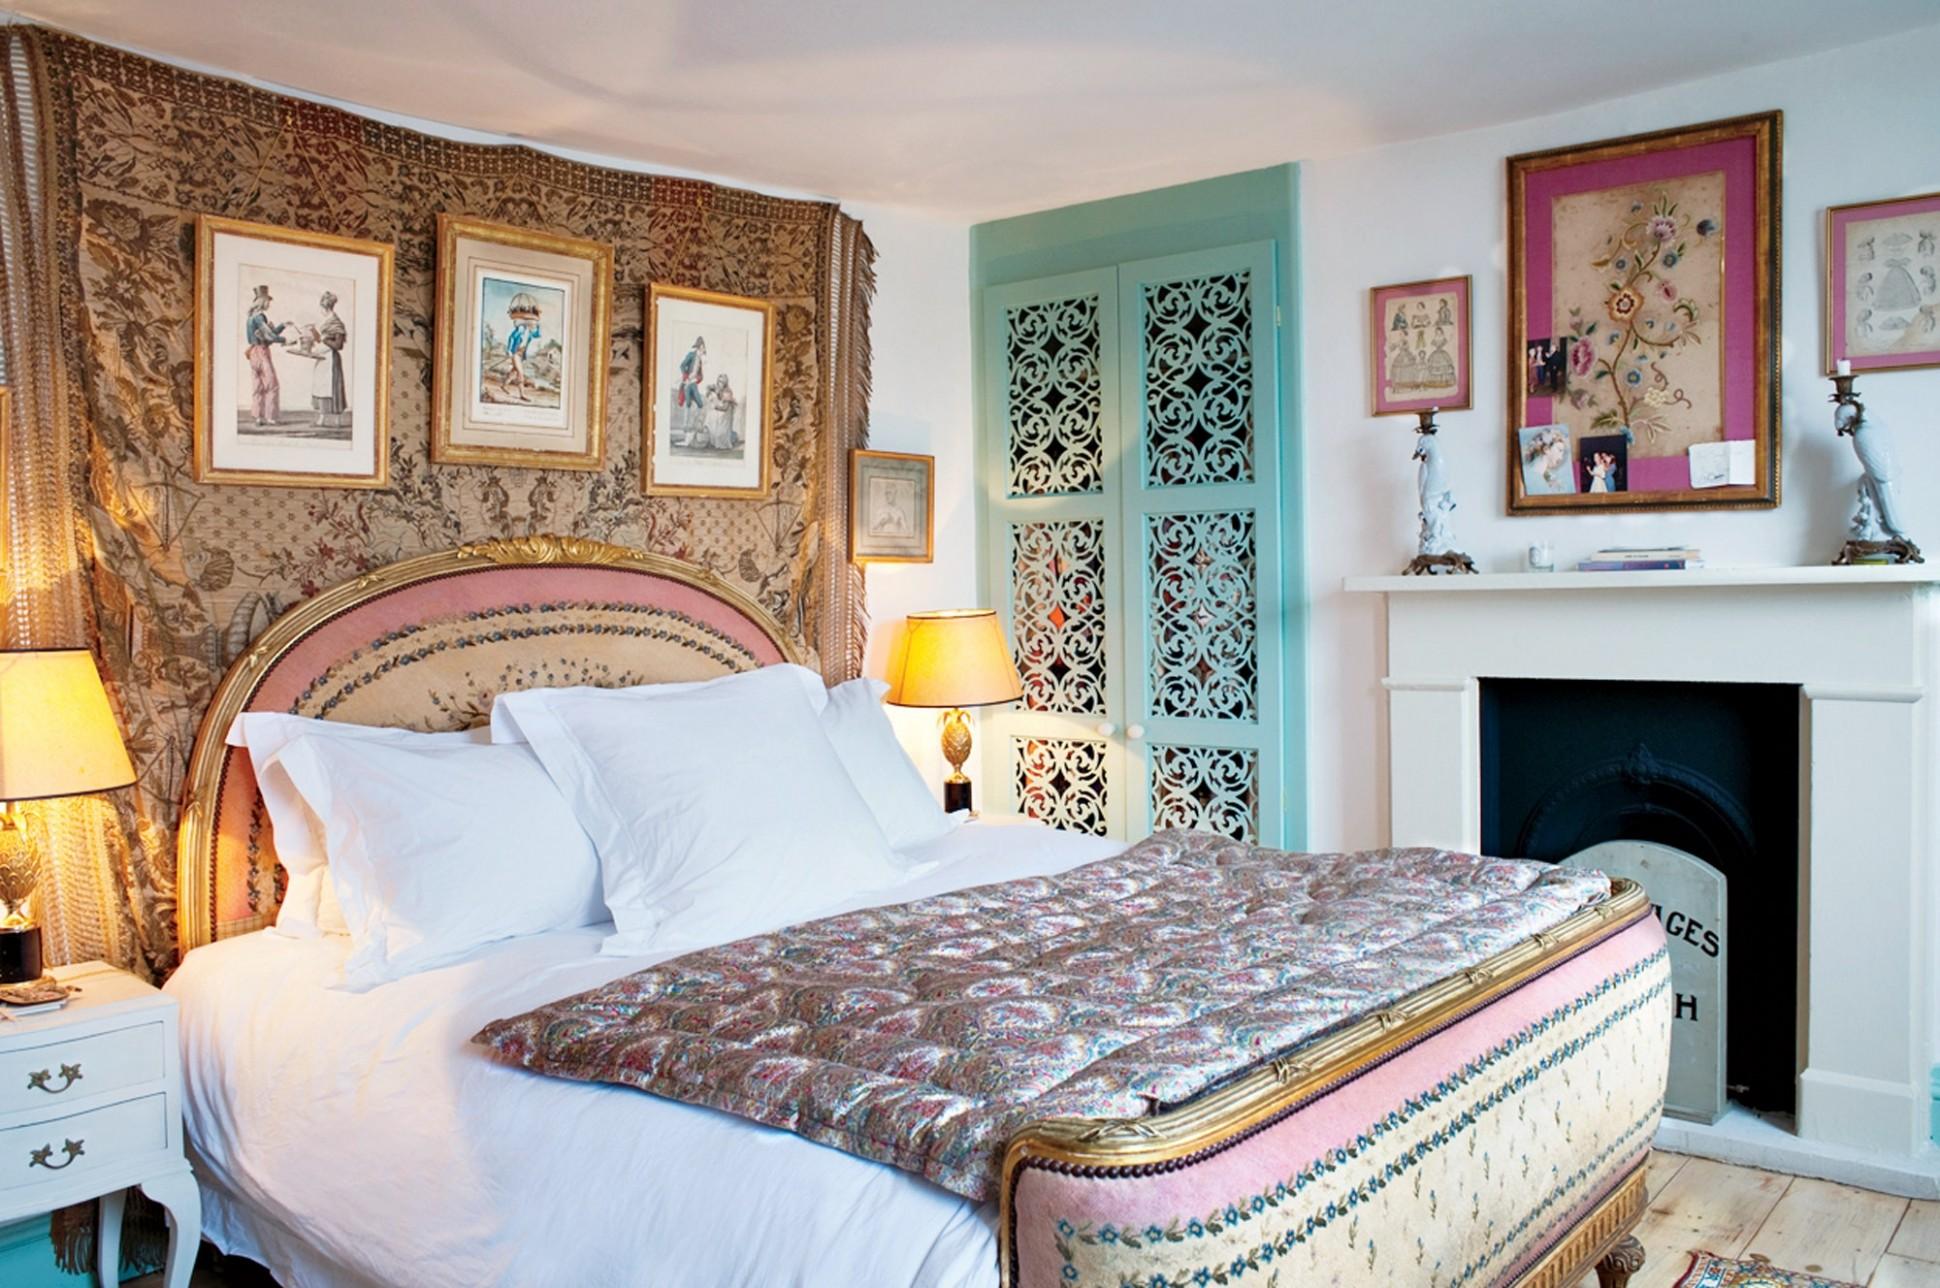 The Most Beautiful Bedrooms in Vogue  Vogue - Bedroom Ideas Vogue